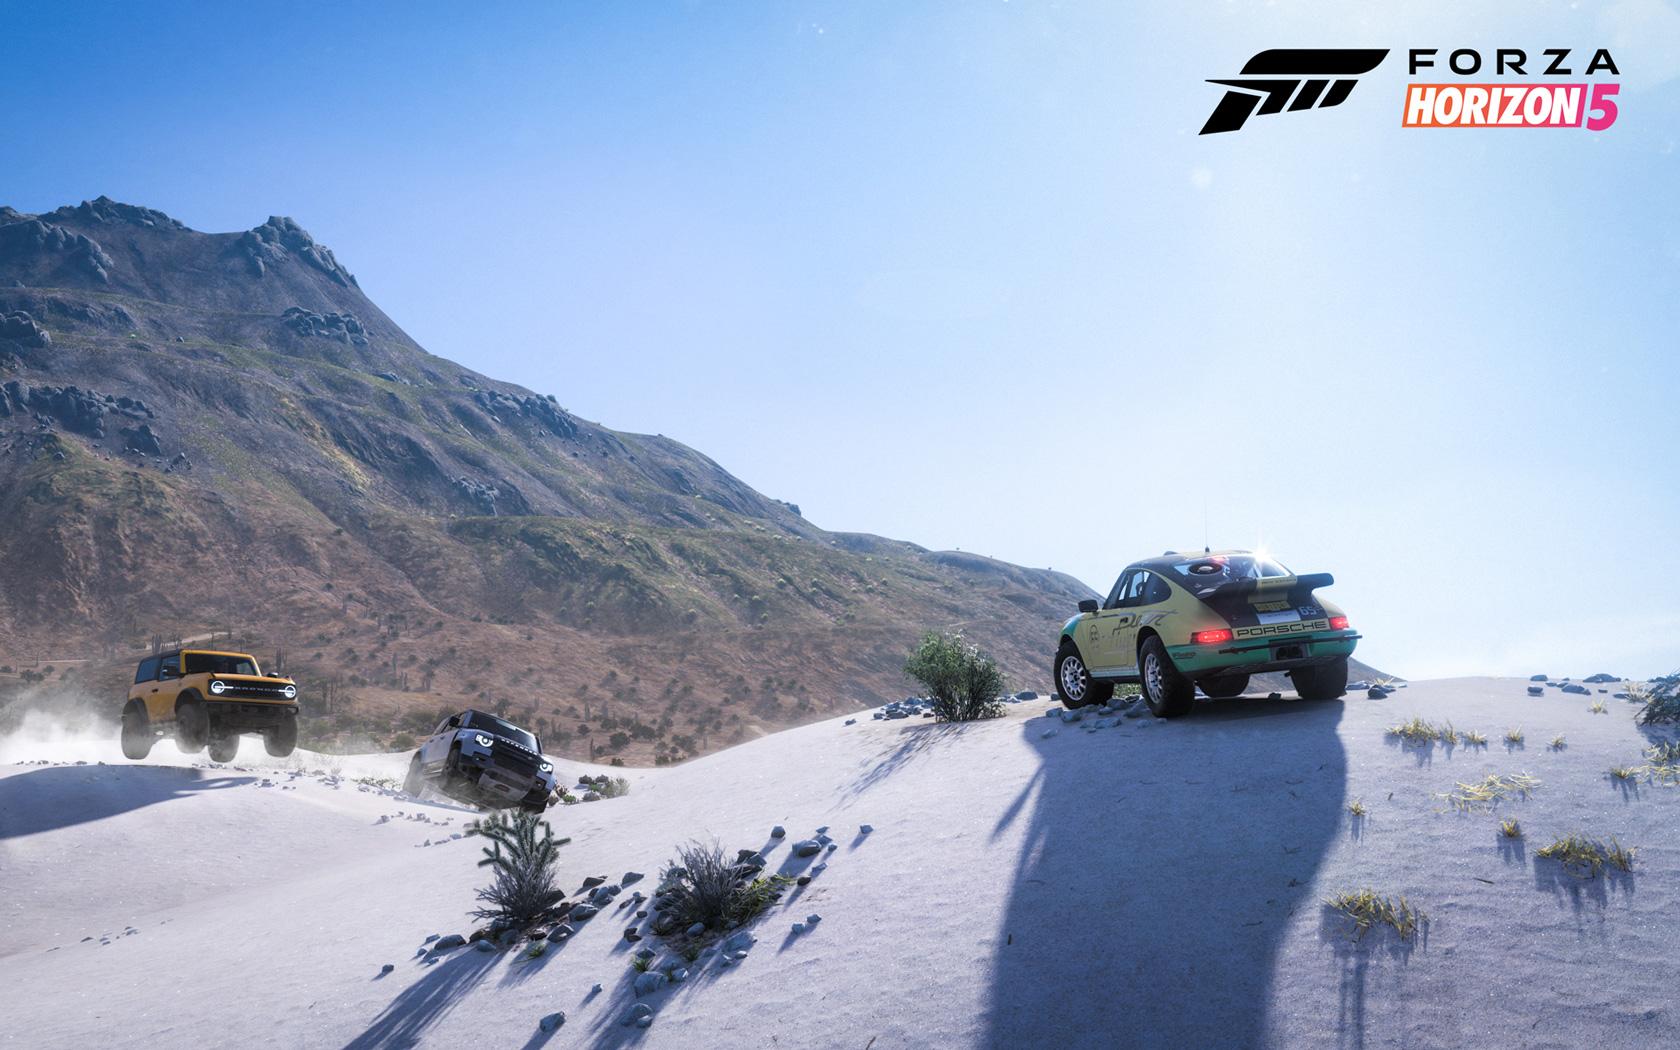 Free Forza Horizon 5 Wallpaper in 1680x1050